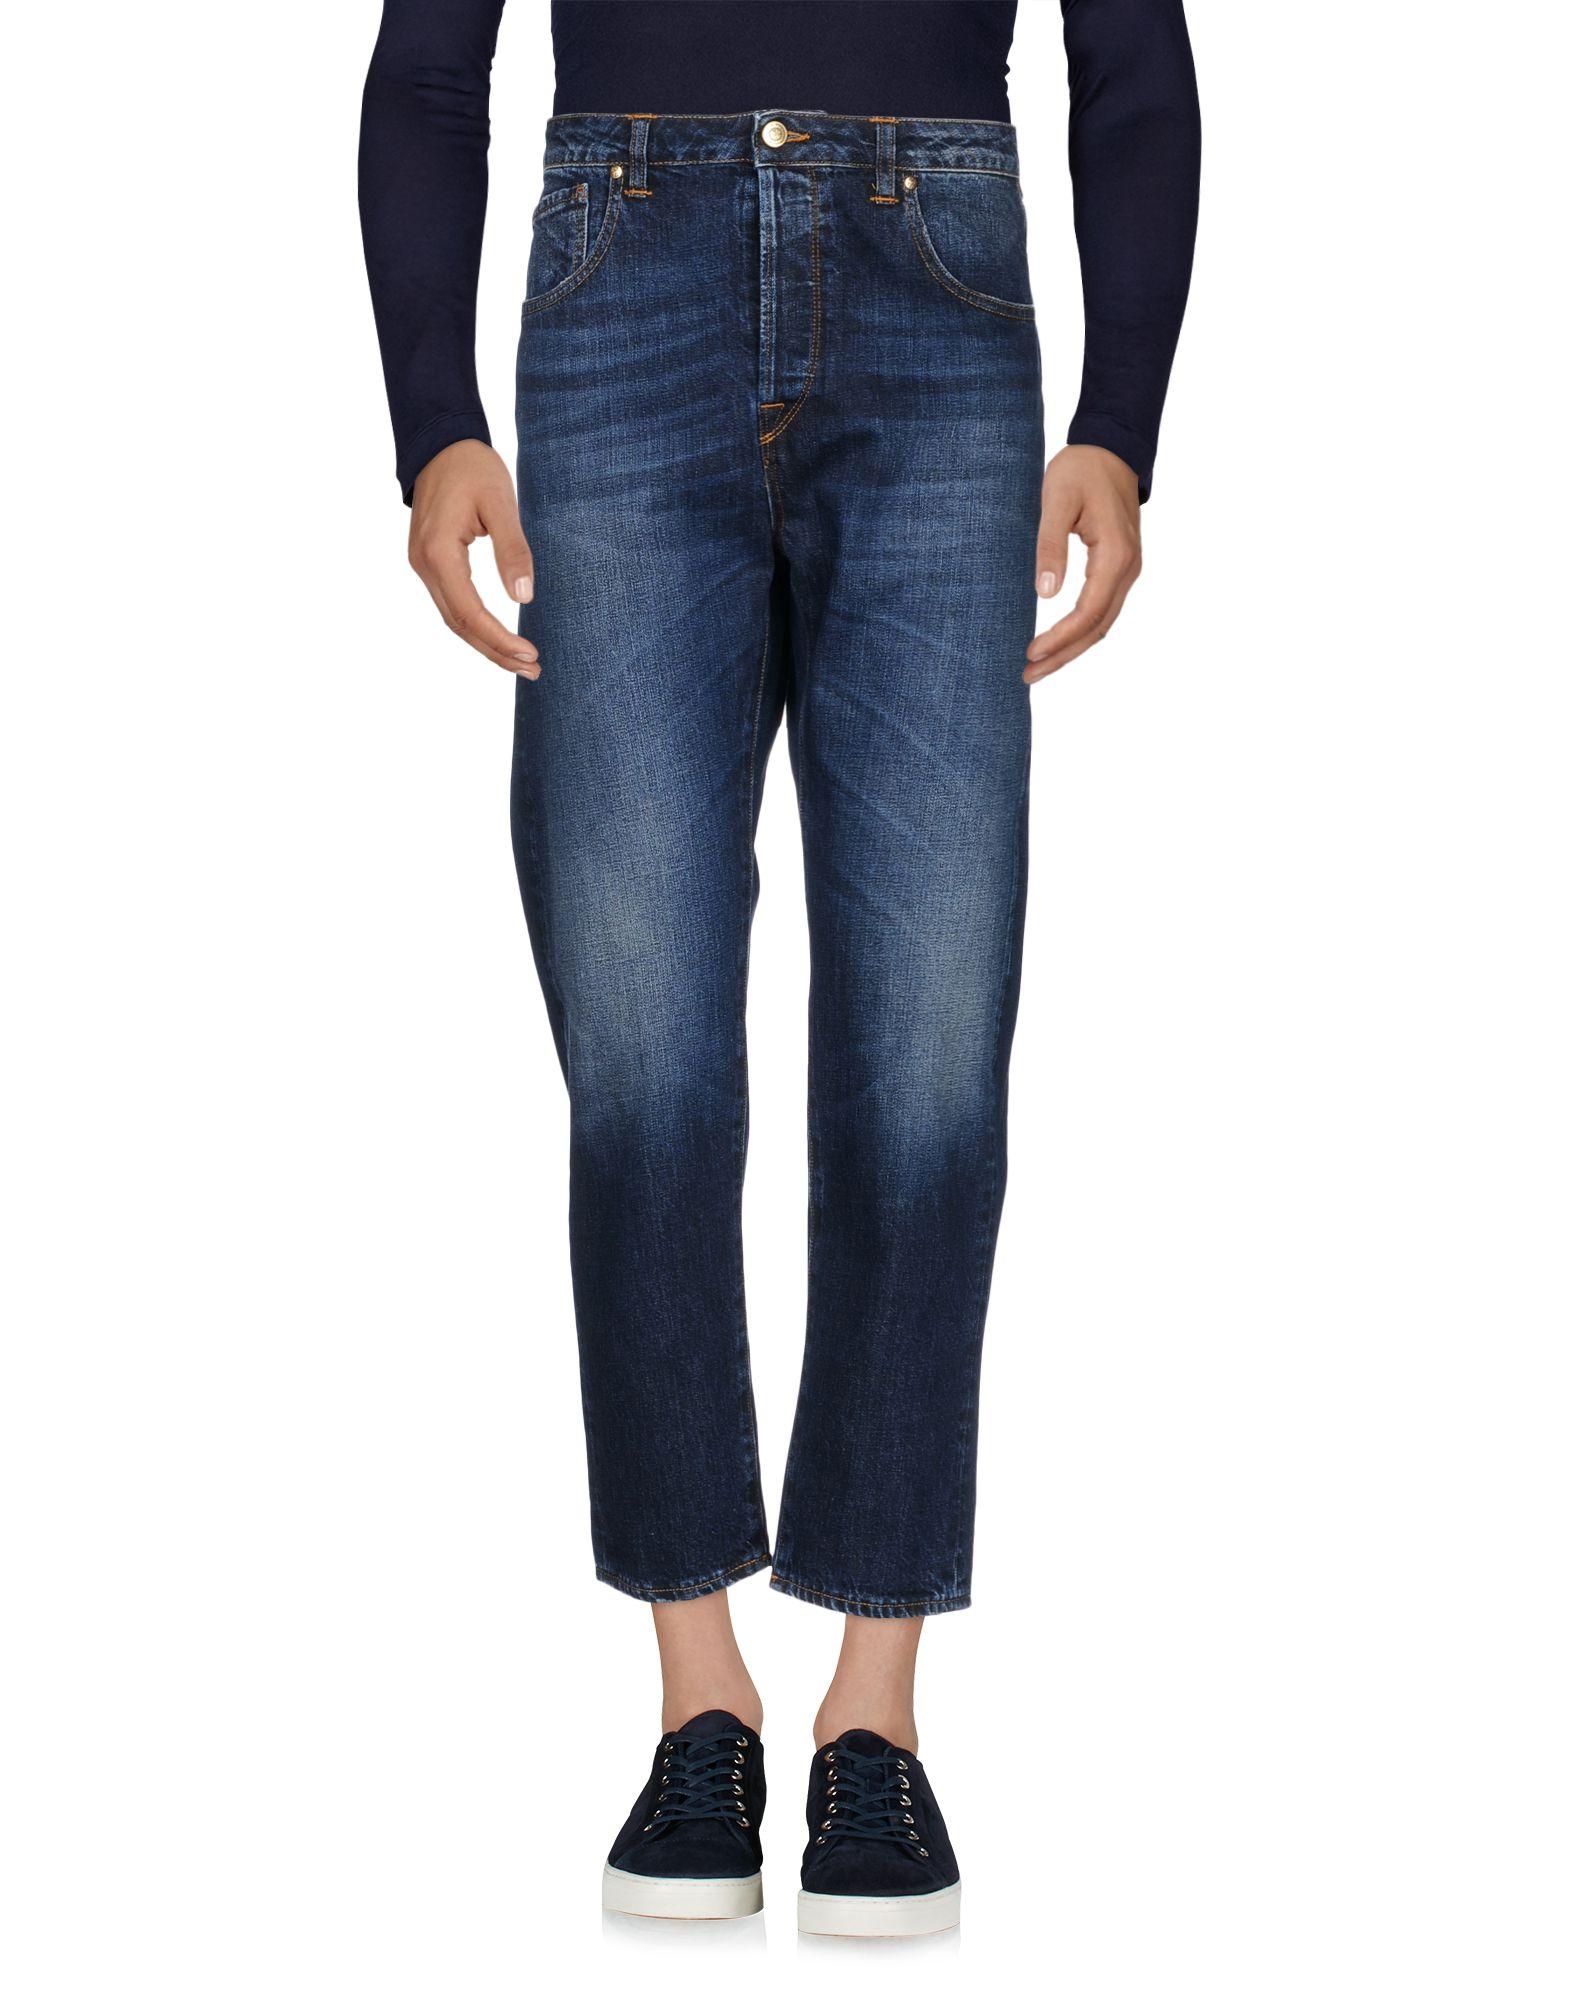 Pantaloni Jeans True Nyc. Uomo - 42681389QO 42681389QO - 6a6af7 ... cc3df8b0263